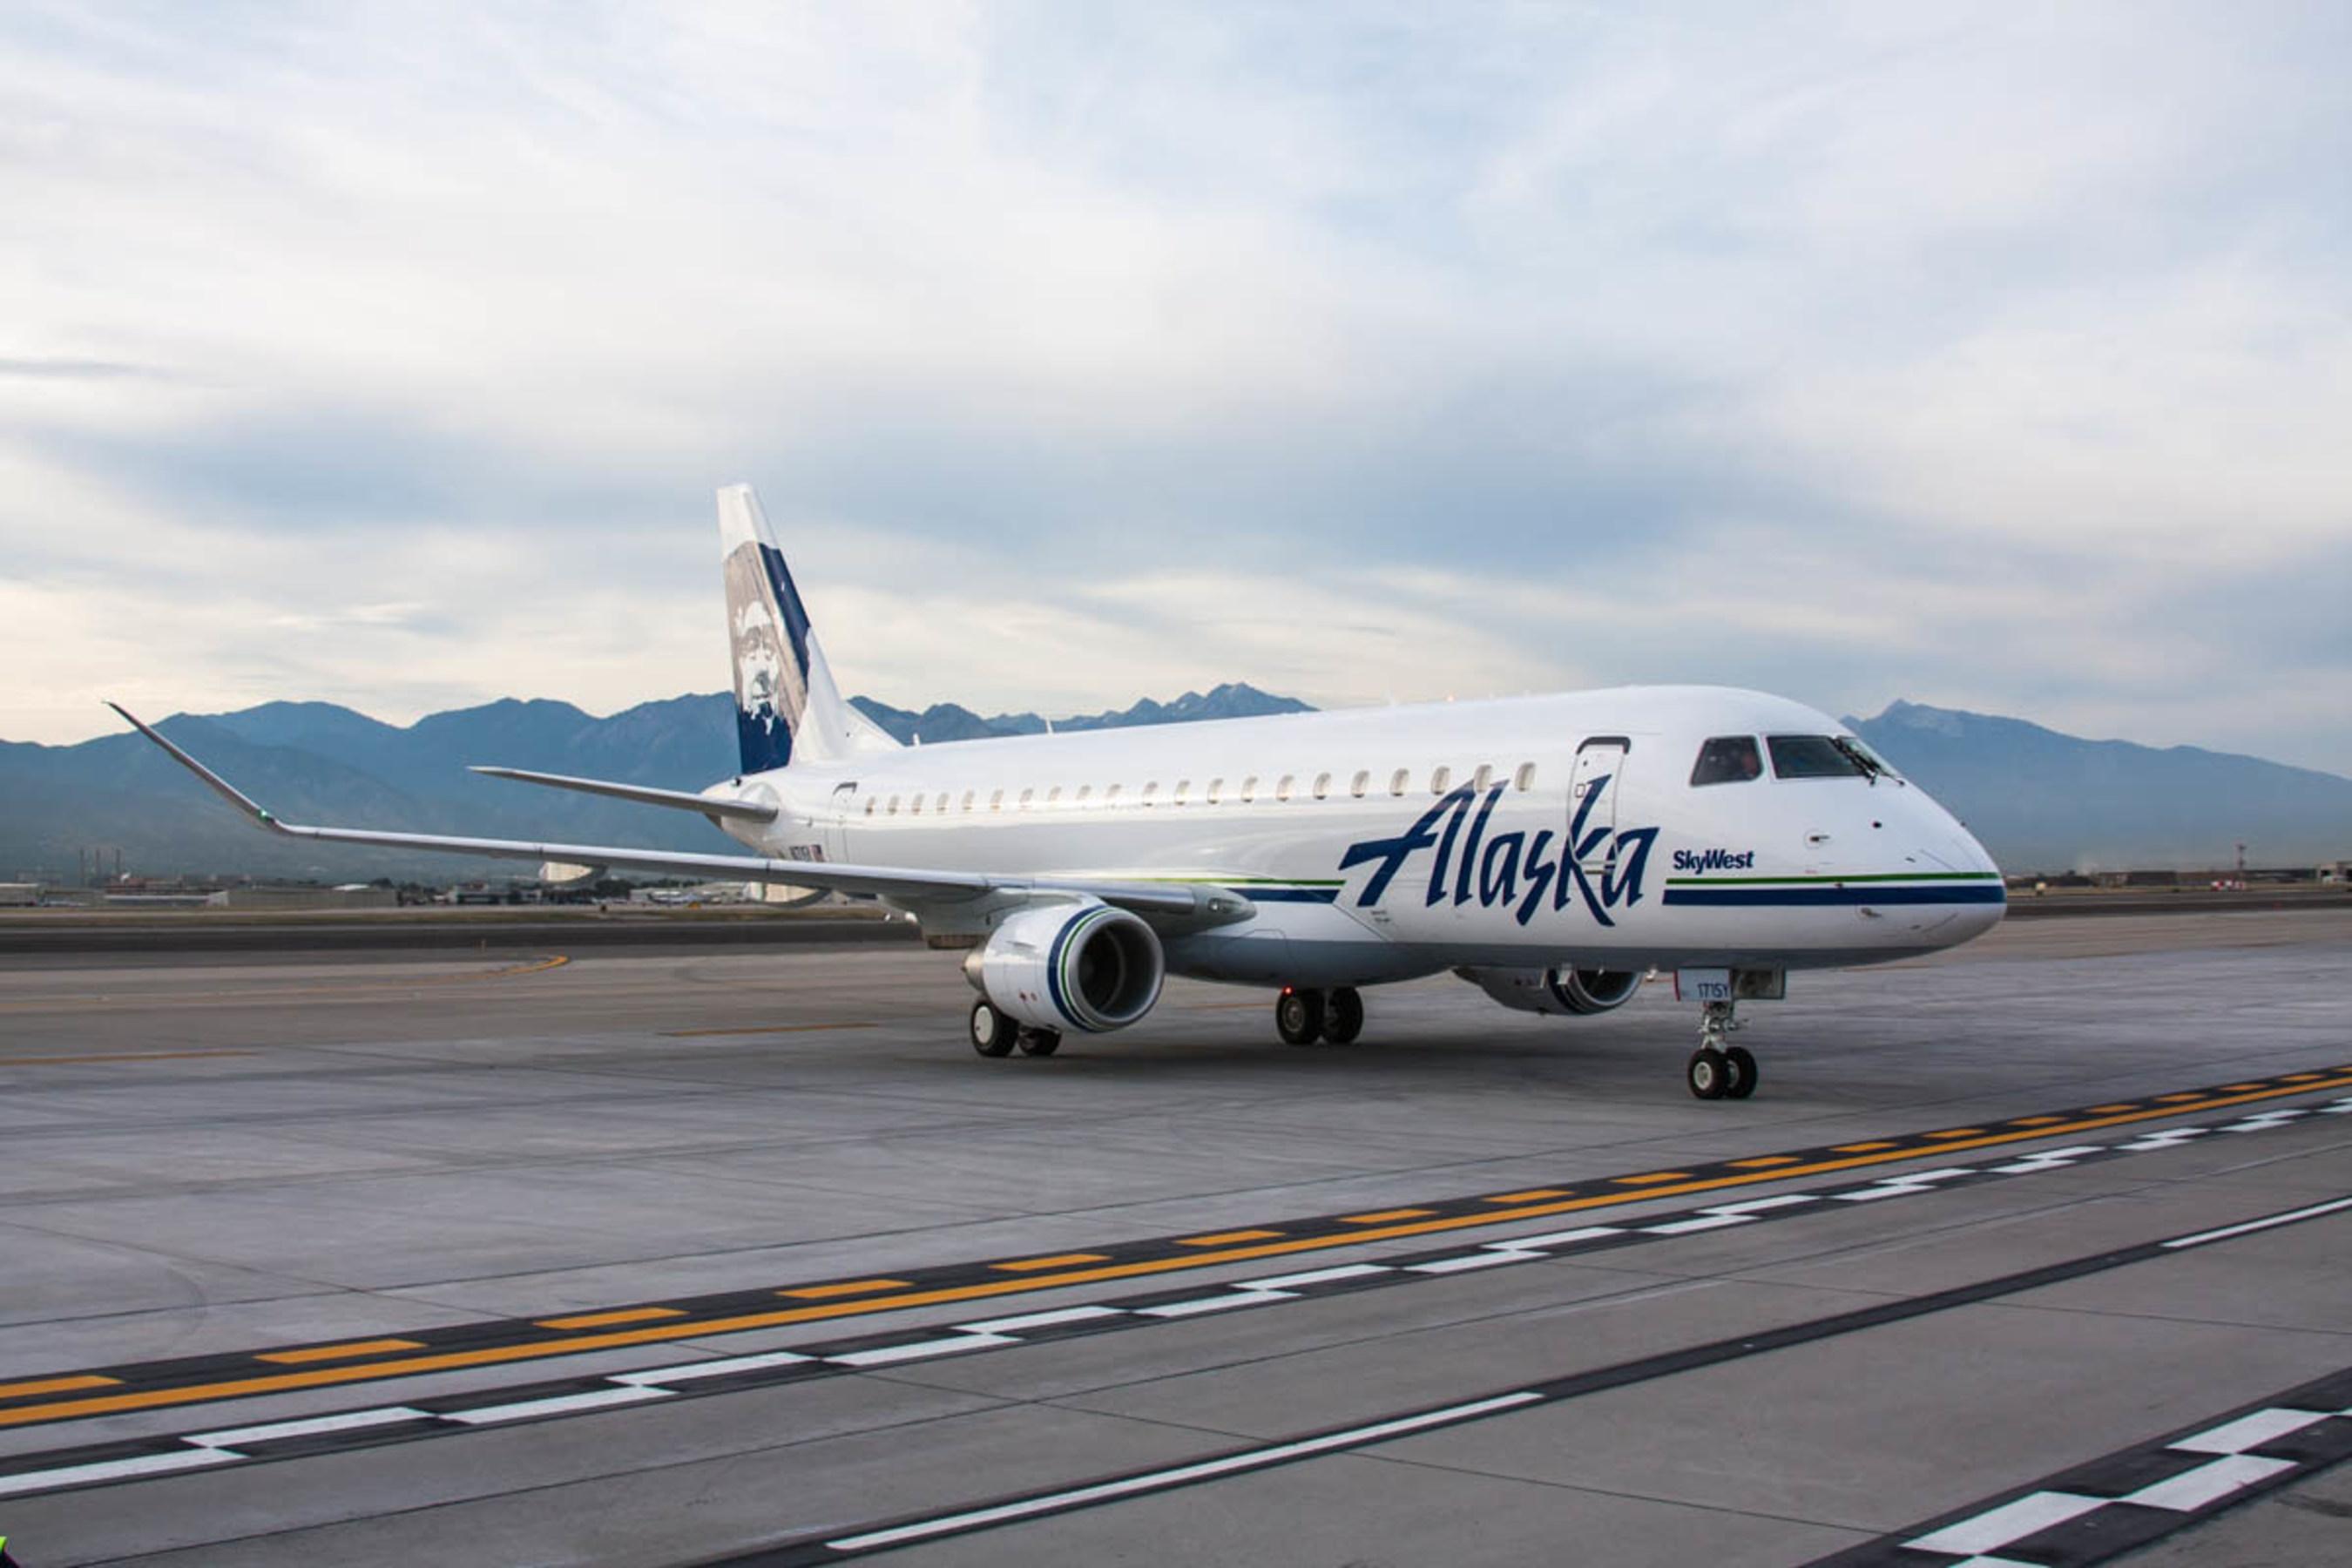 Alaska will launch new flying between Portland and Omaha, Minneapolis-St.Paul and Kansas City starting Feb. 18, 2016.